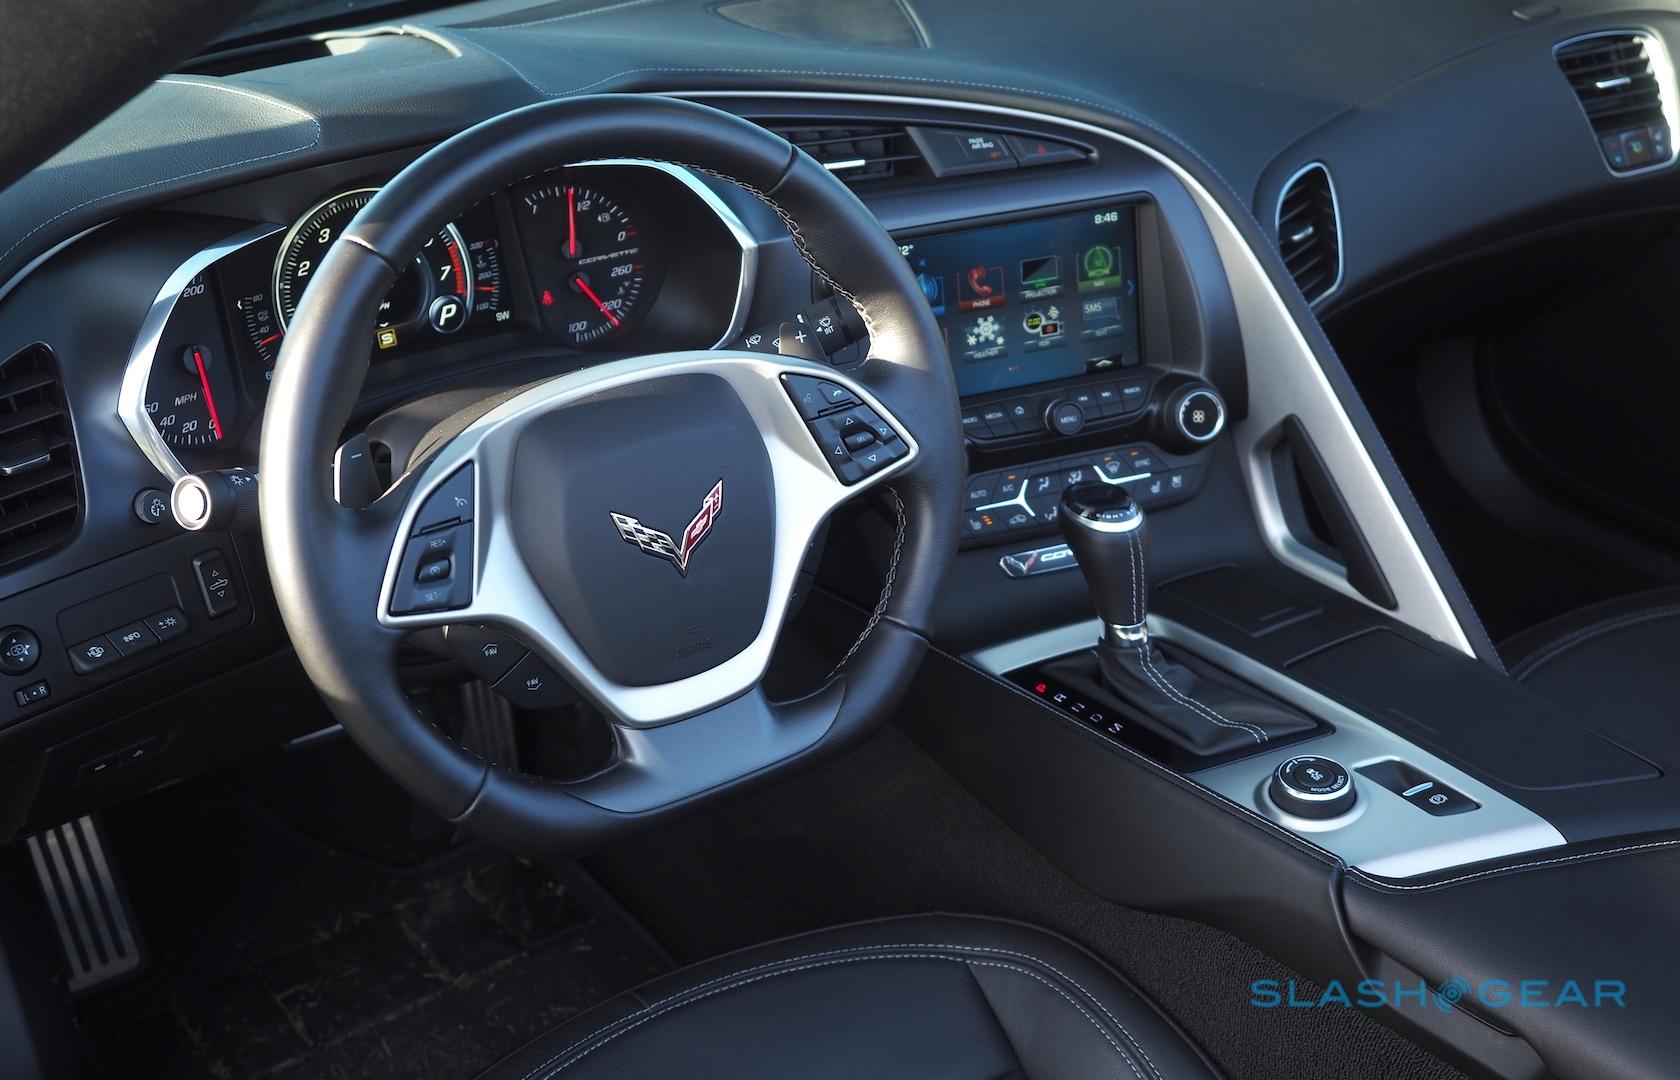 2019 Chevrolet Corvette Z51 Gallery - SlashGear